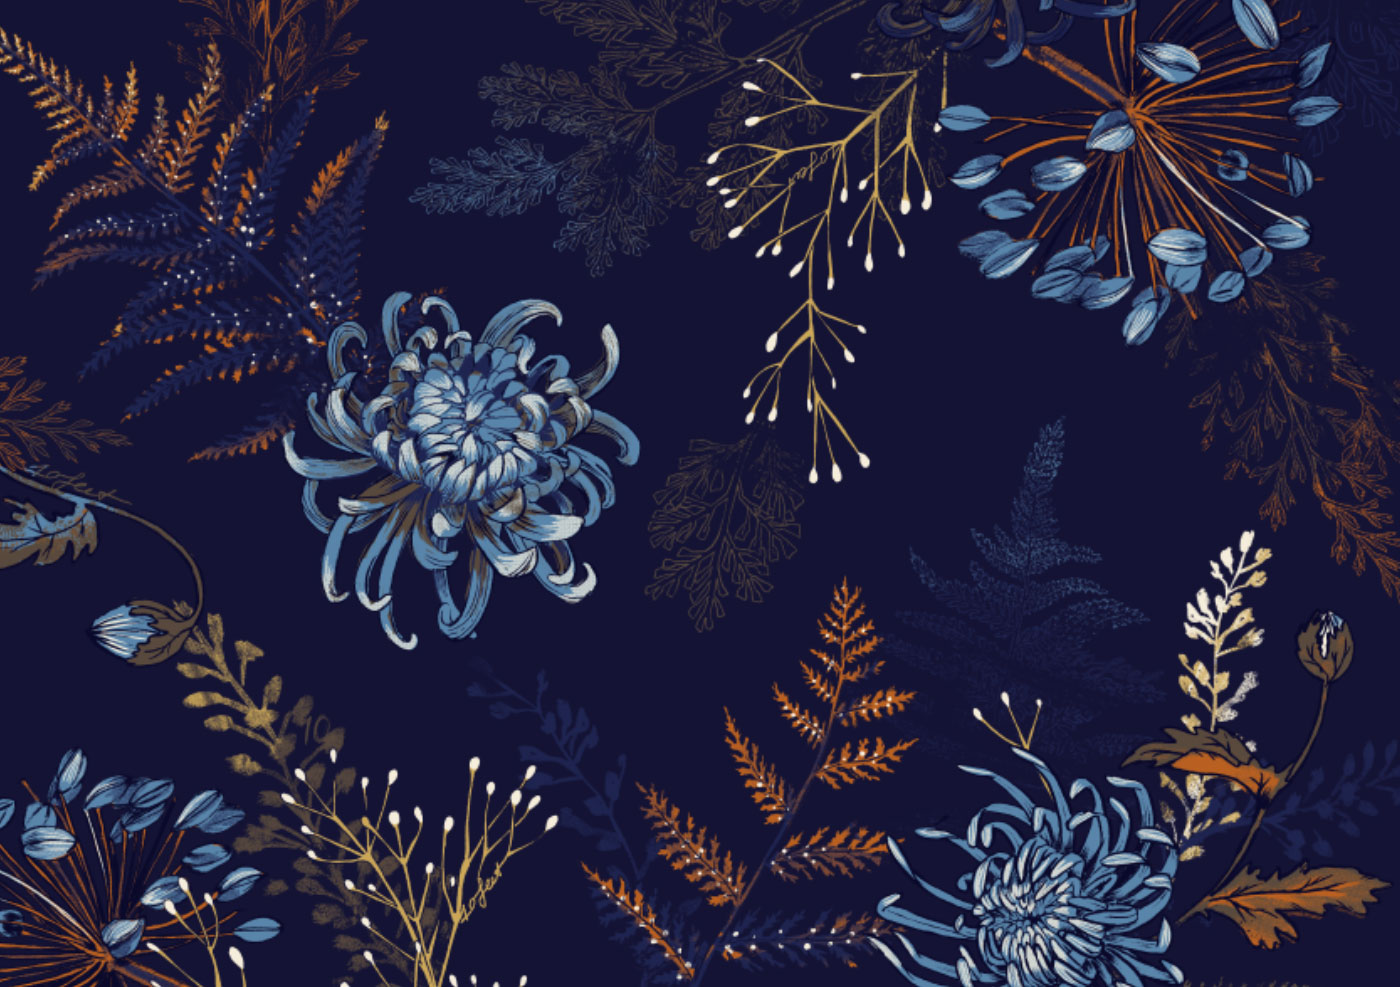 Fig. 1. Pattern in Night Blue: Chrysanthemum, fern, agapanthus